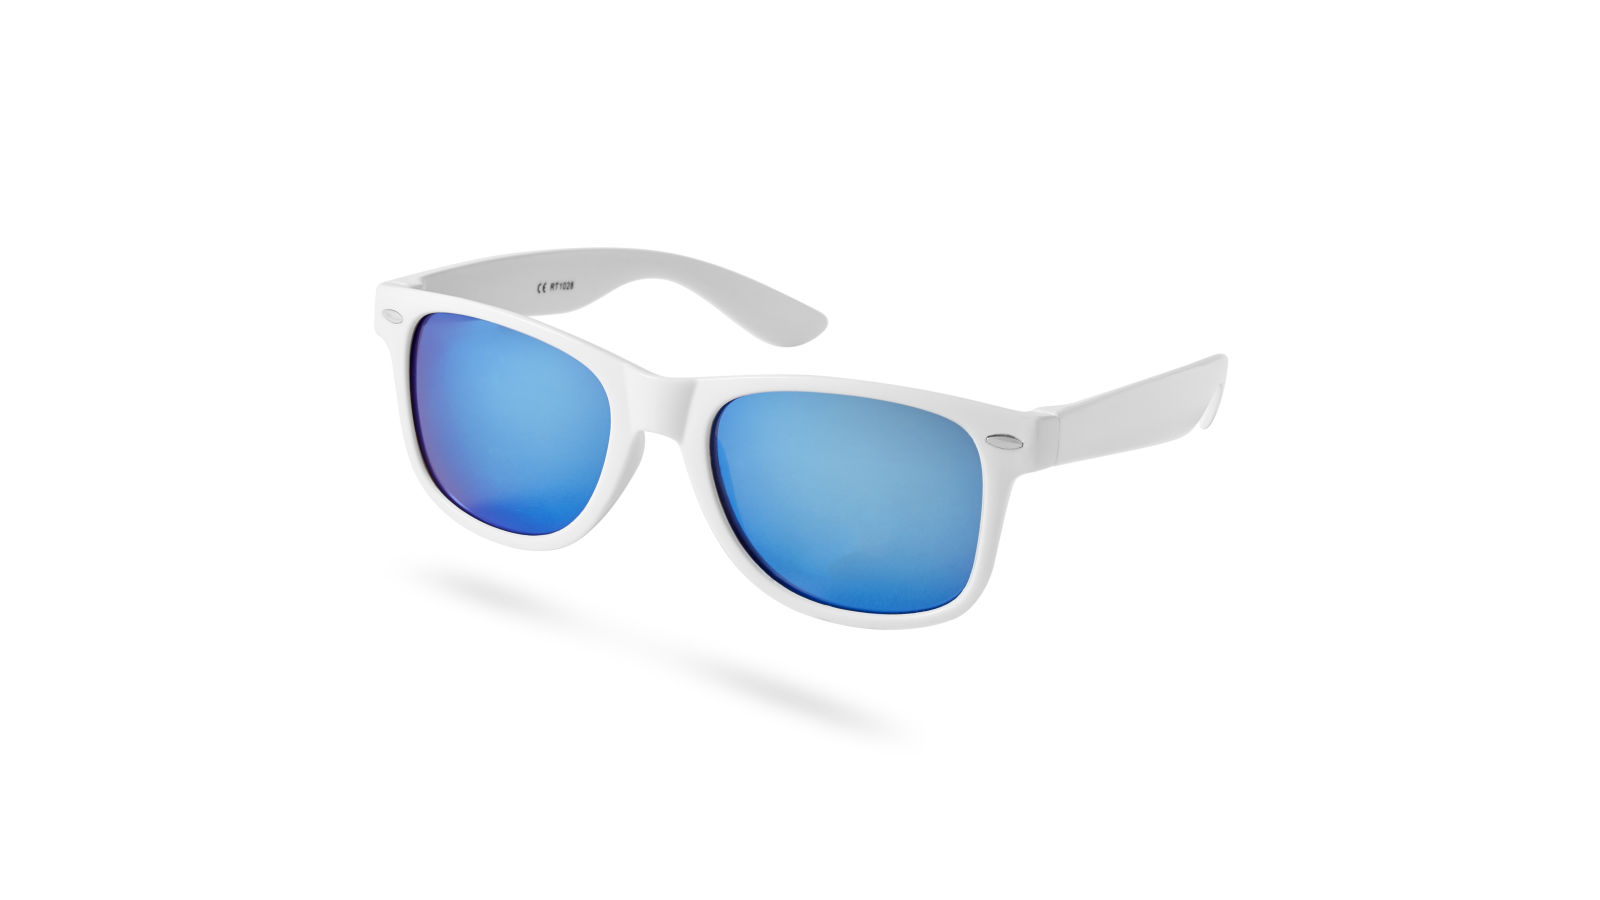 Óculos de Sol Dinâmicos Azuis e Brancos   Em stock!   Paul Riley 5ee21f4026